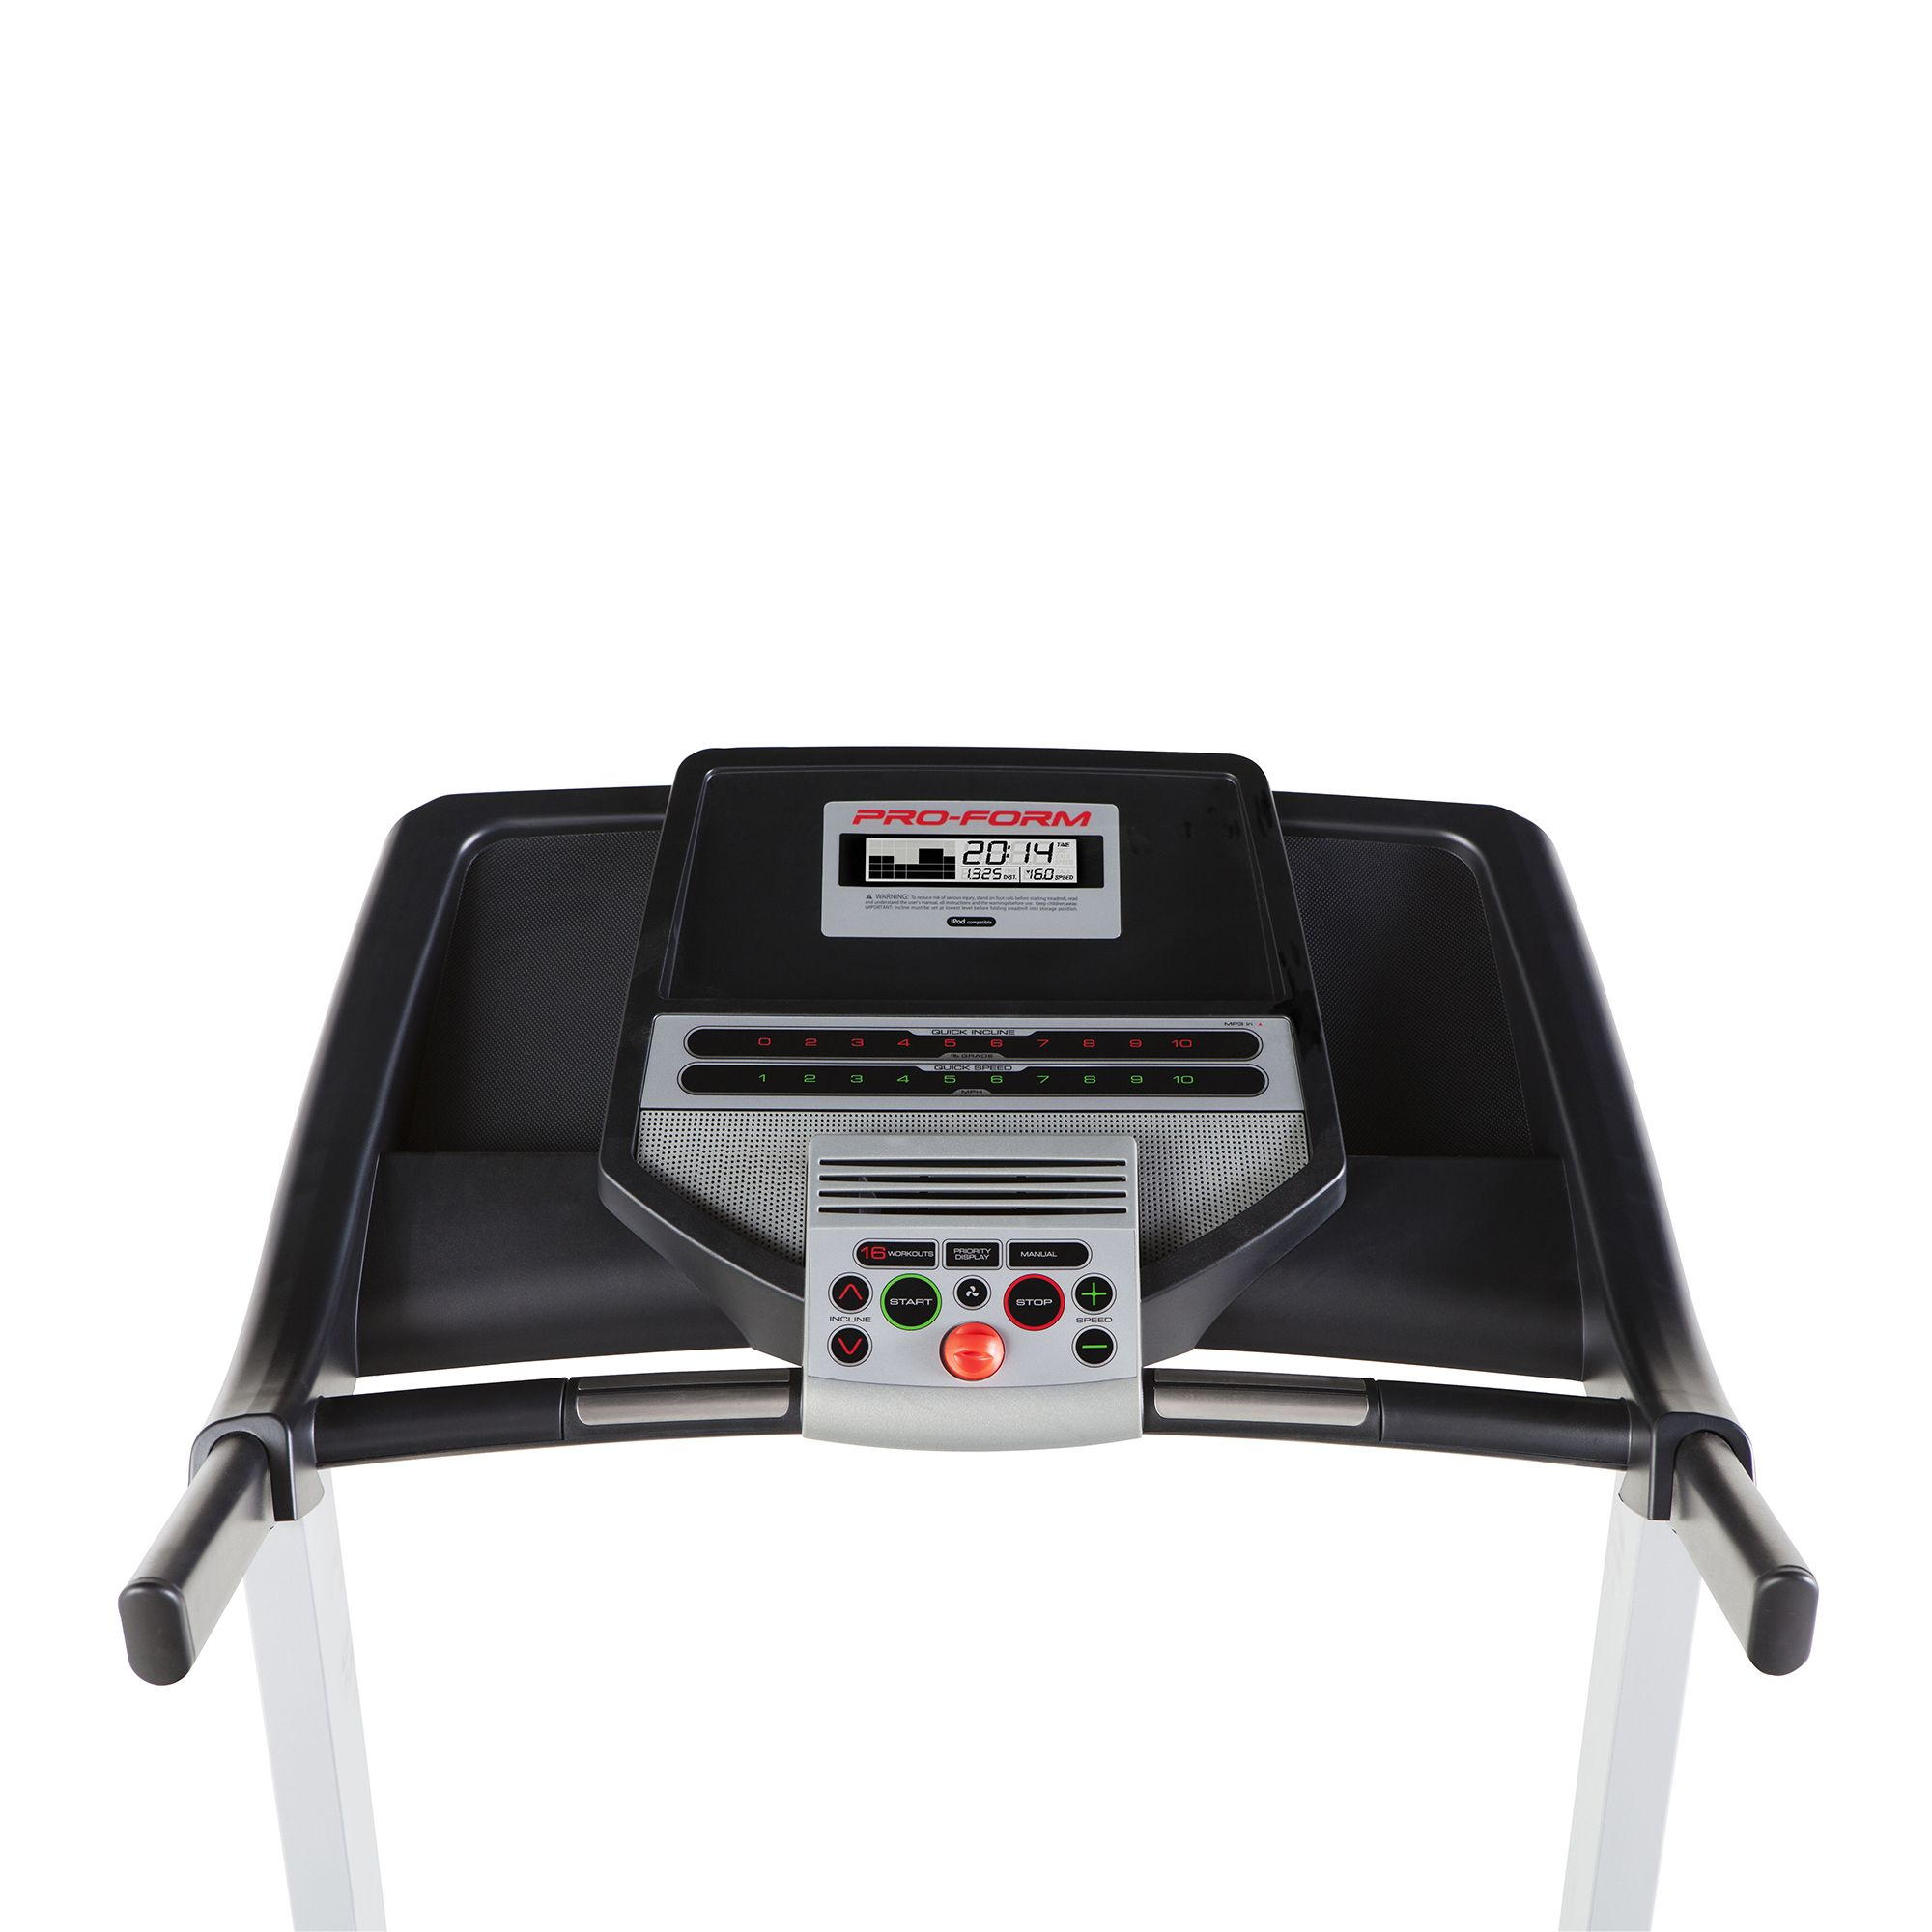 Icon Proform Power 795 Treadmill: ProForm 530 ZLT Treadmill